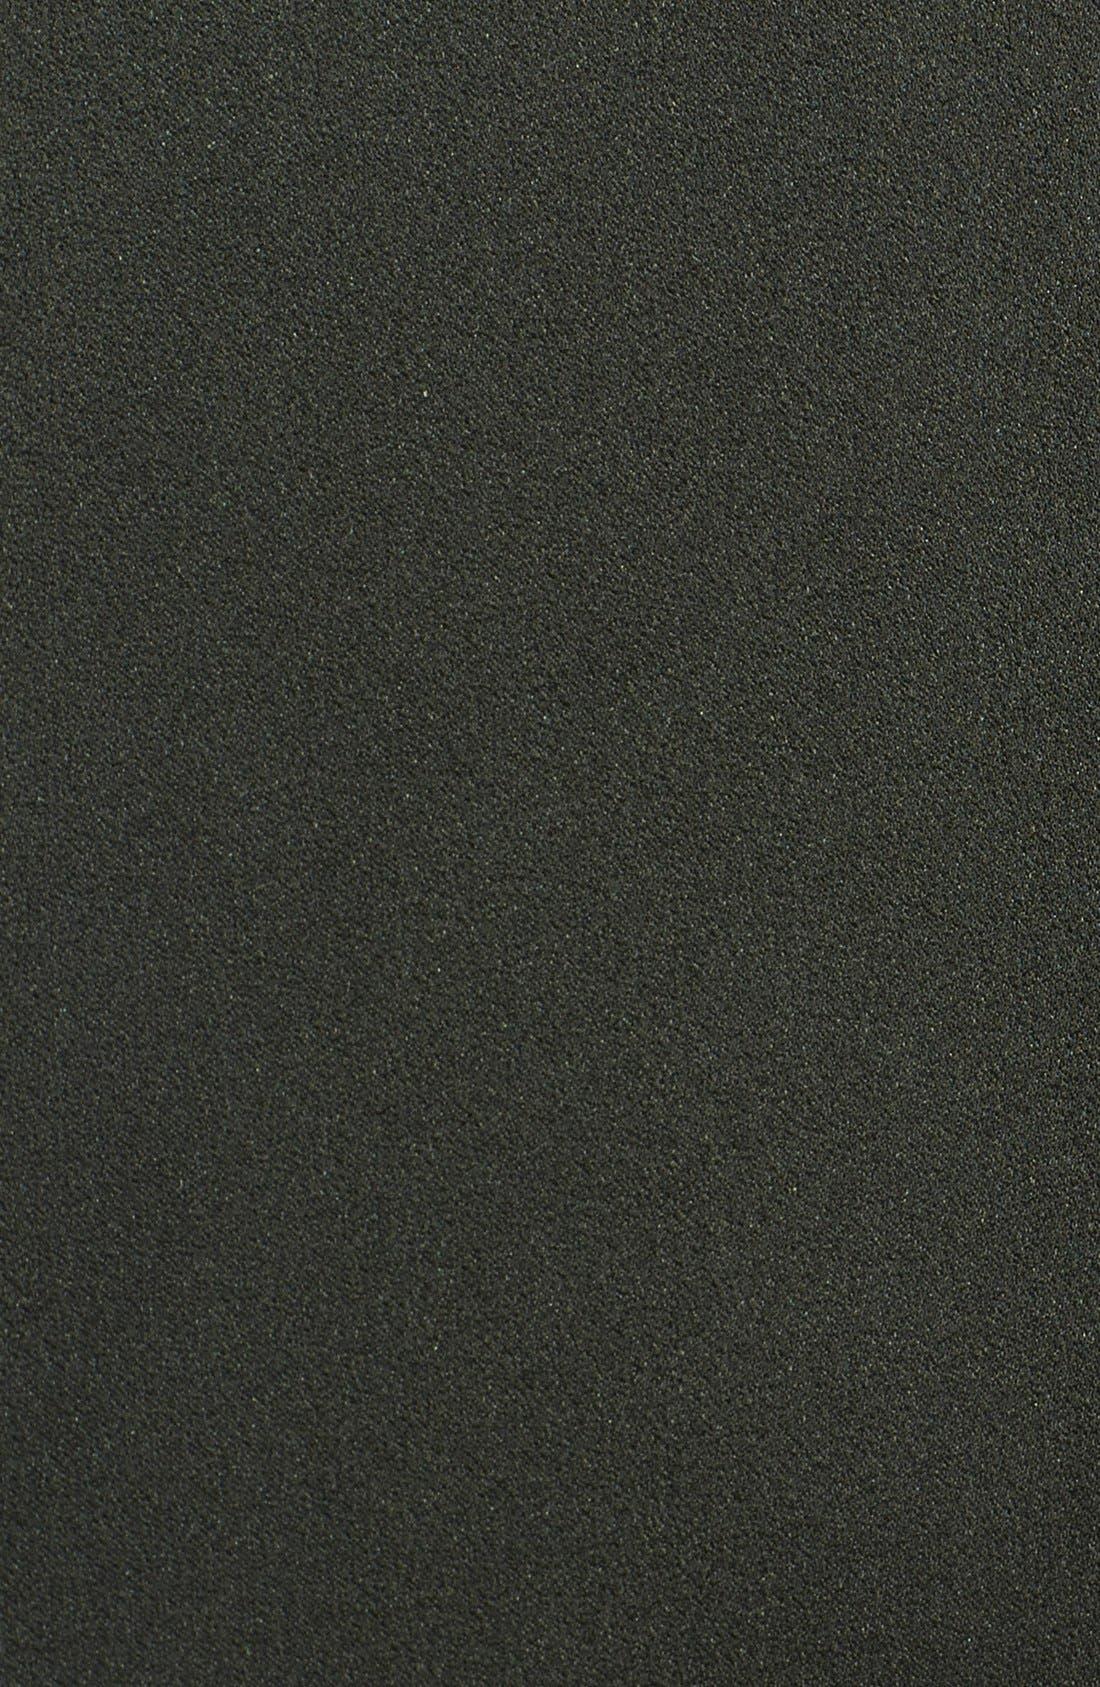 Alternate Image 4  - Stella McCartney Sable Crepe & Satin Dress with Neck Hardware